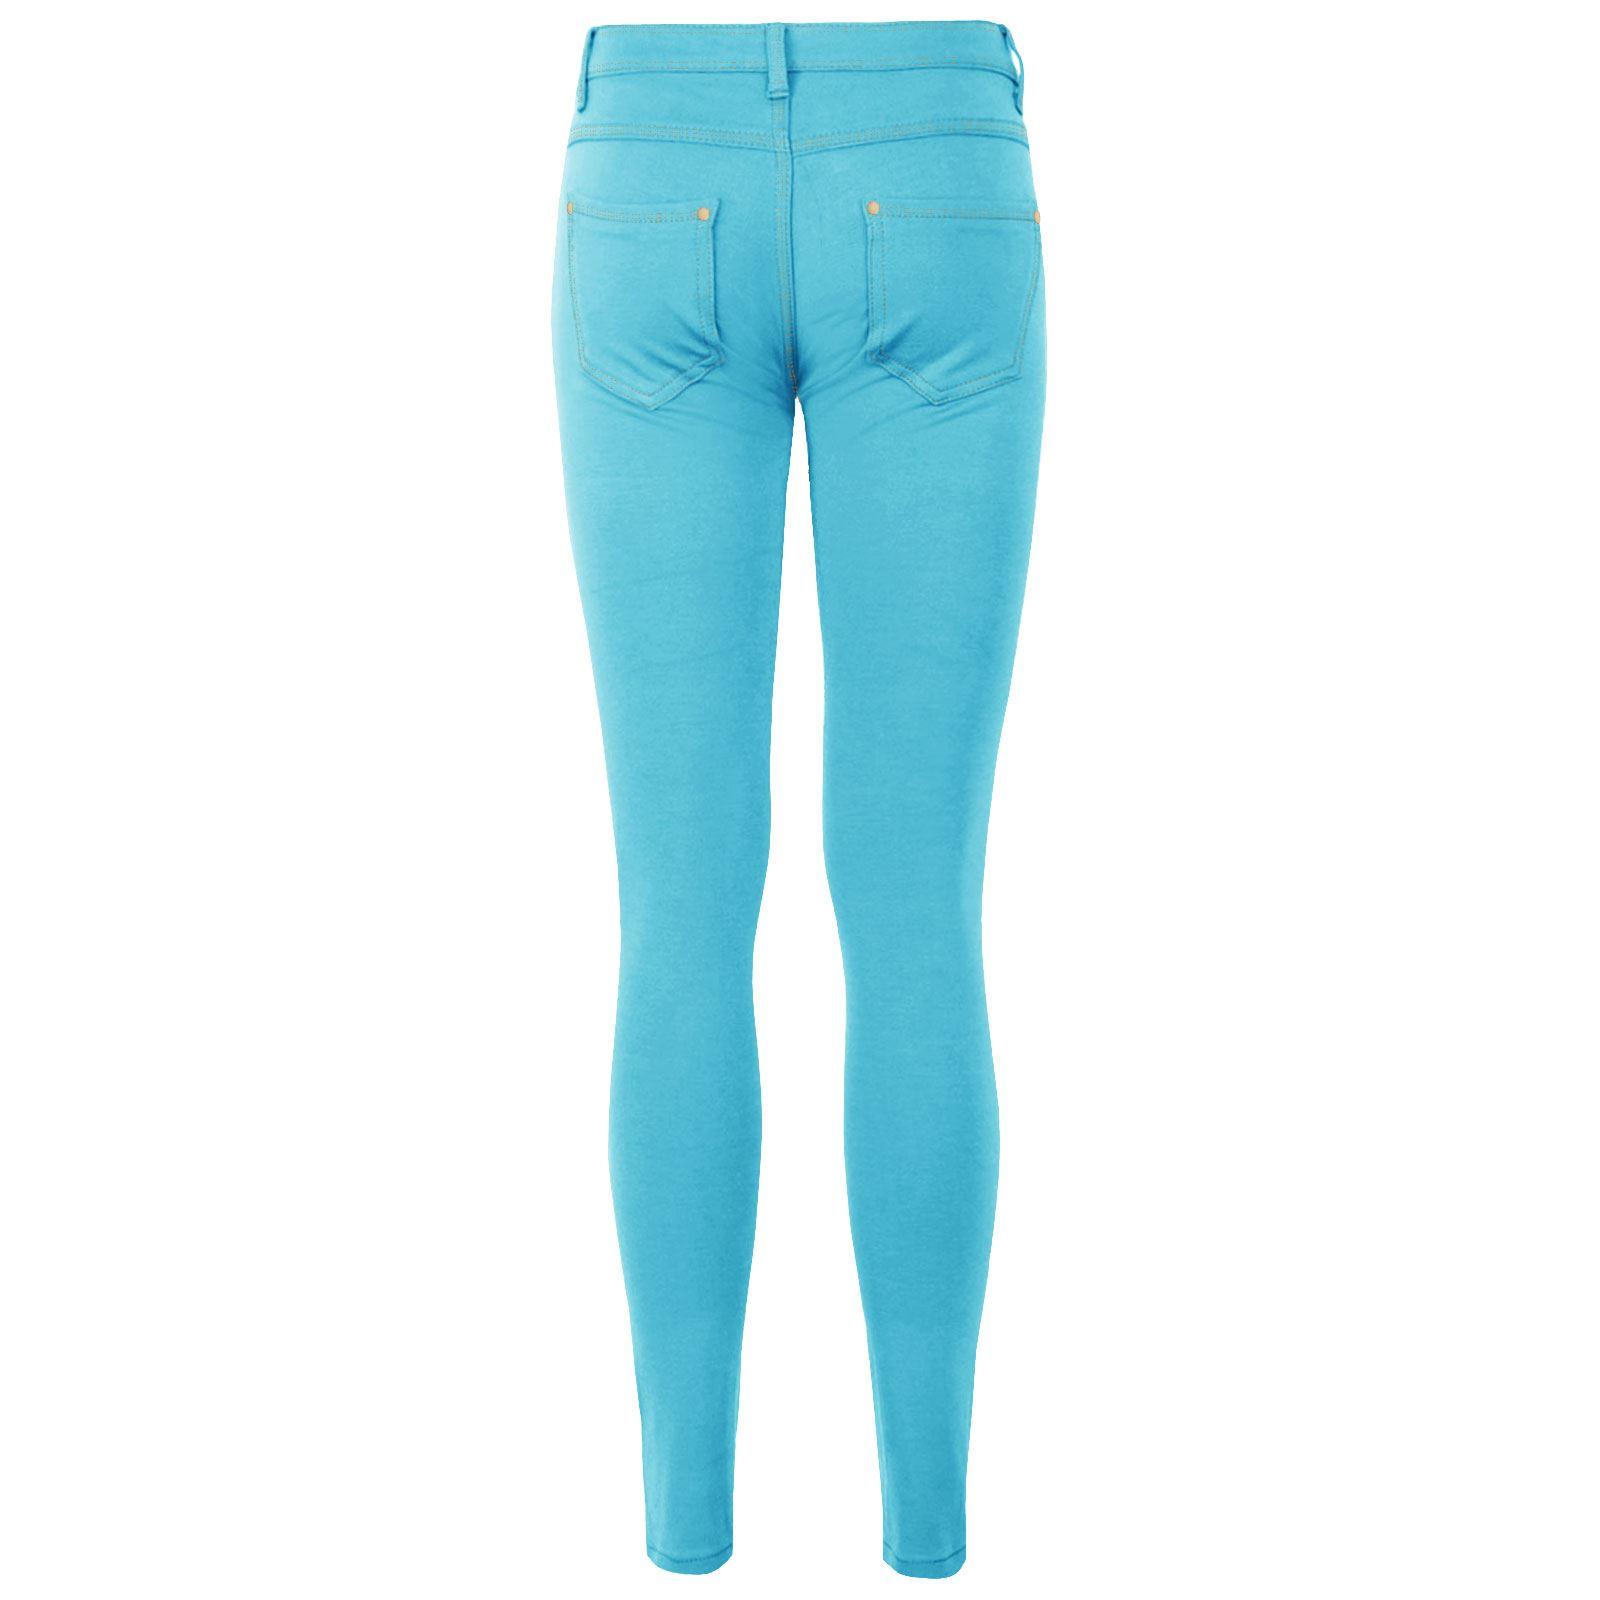 Da Donna Con Elastico Jeans Jeggings Pantaloni Per Bambine Skinny Pantaloni Slim Fit 8-26